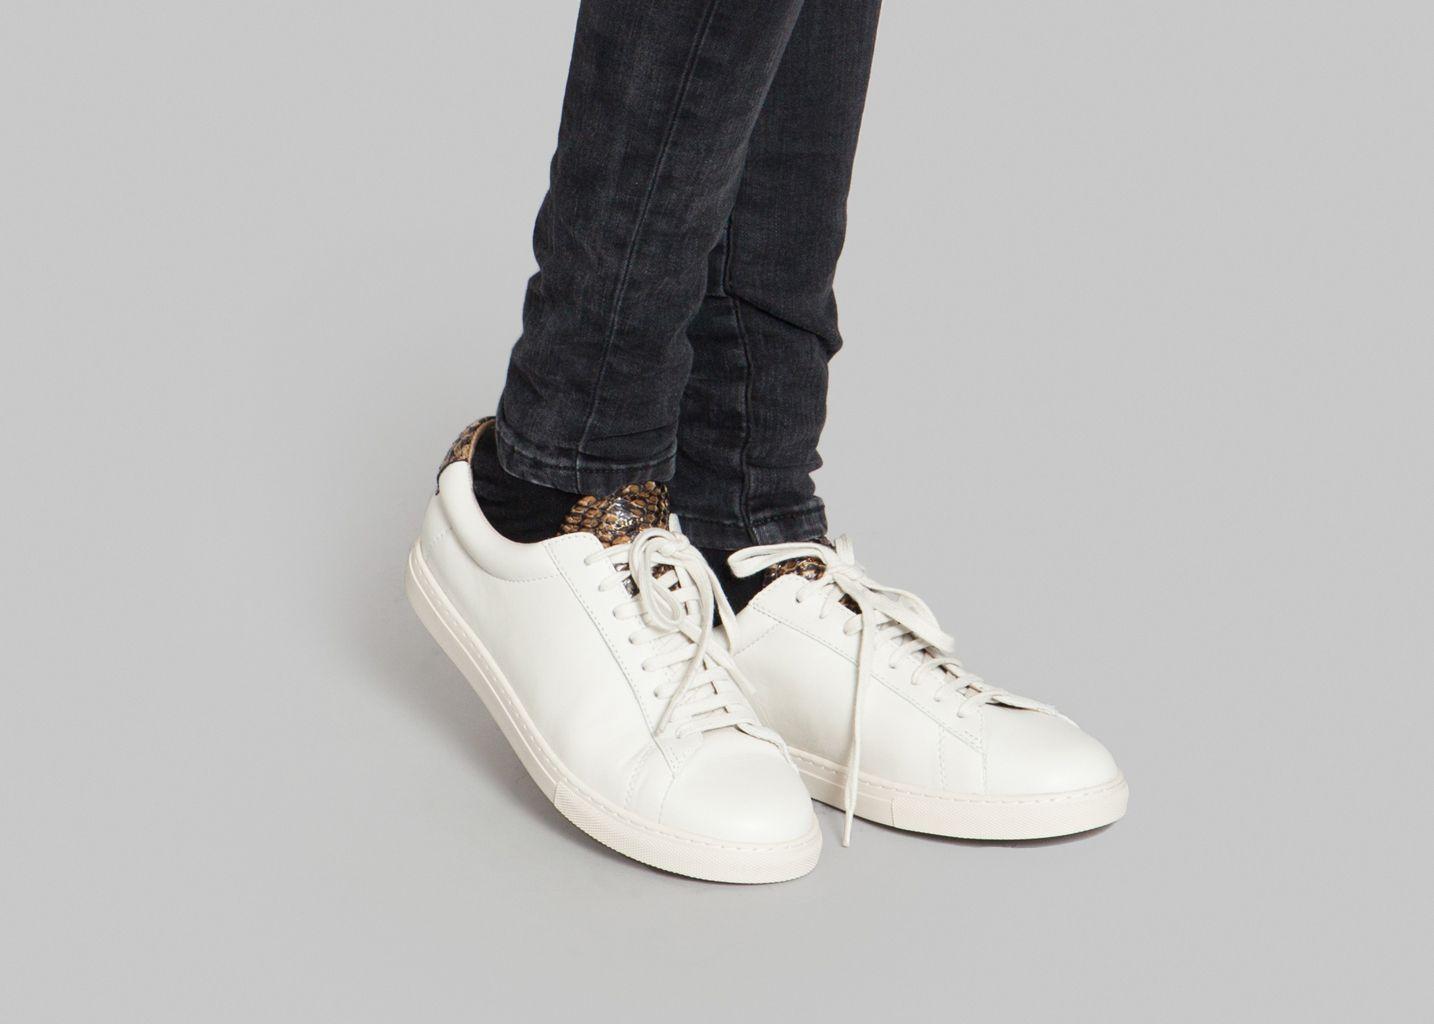 Zespà Nappa leather sneakers JI367GX5